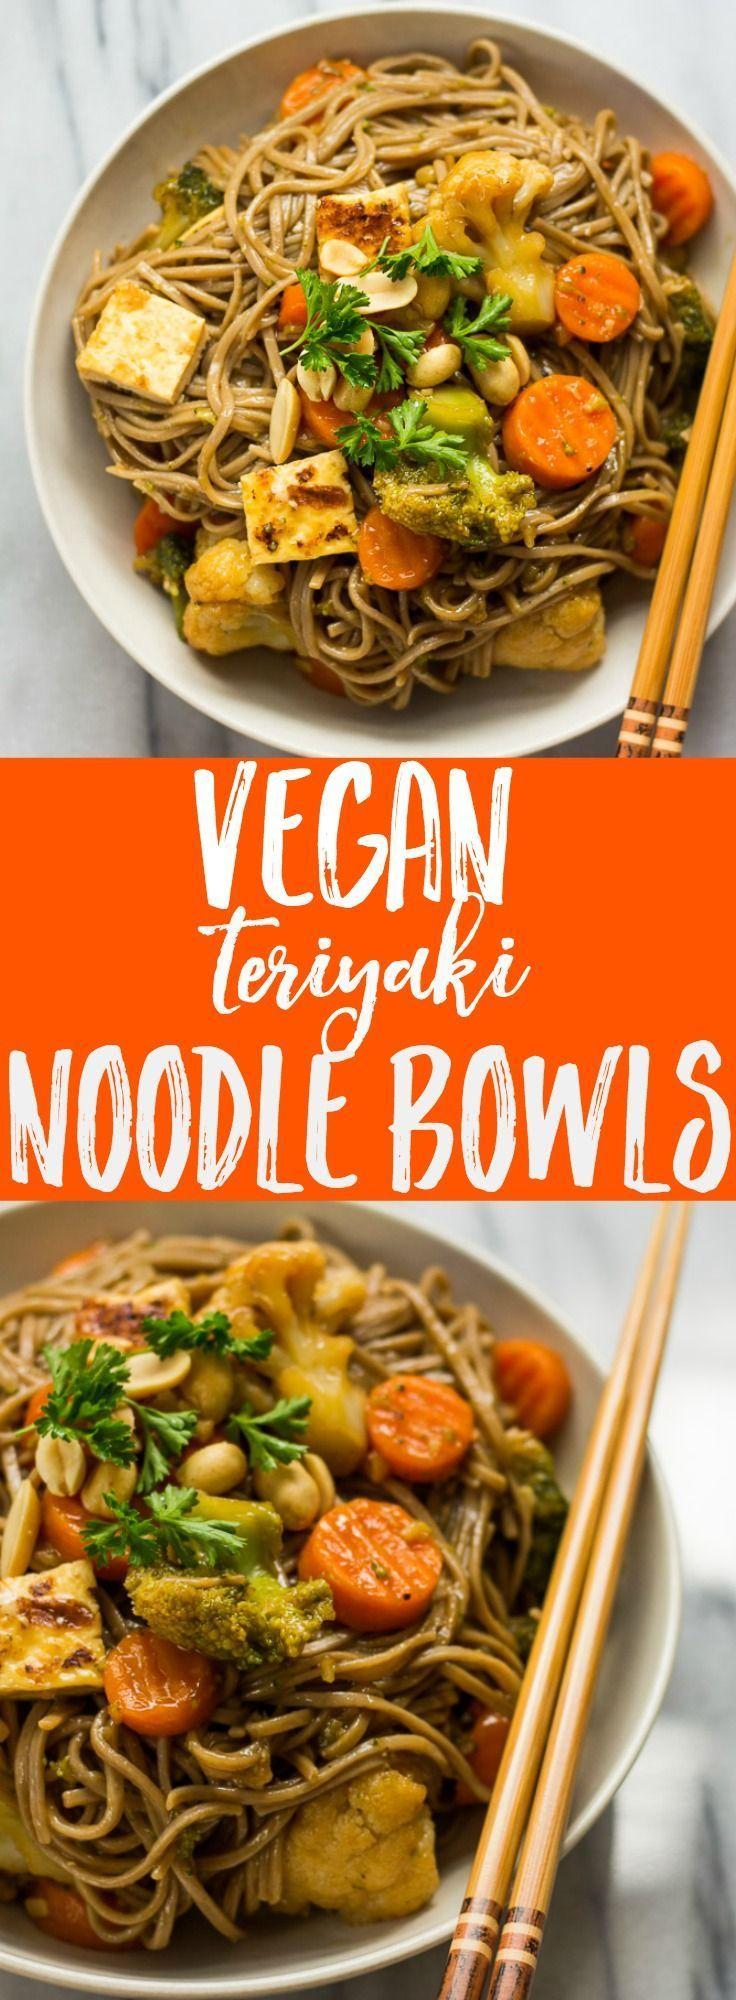 Vegan Teriyaki Noodle Bowls | Nora Cooks